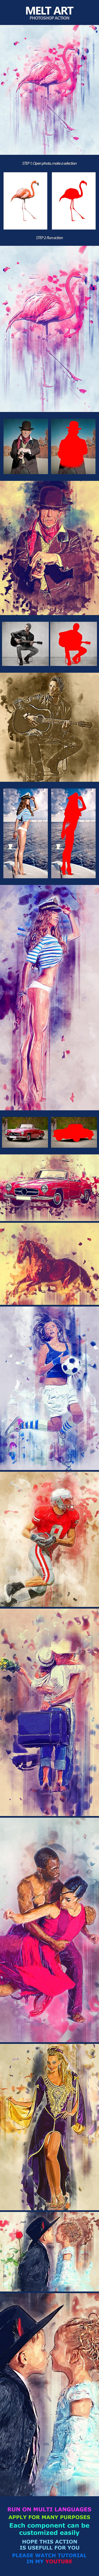 Melt Art - Photo Effects Actions